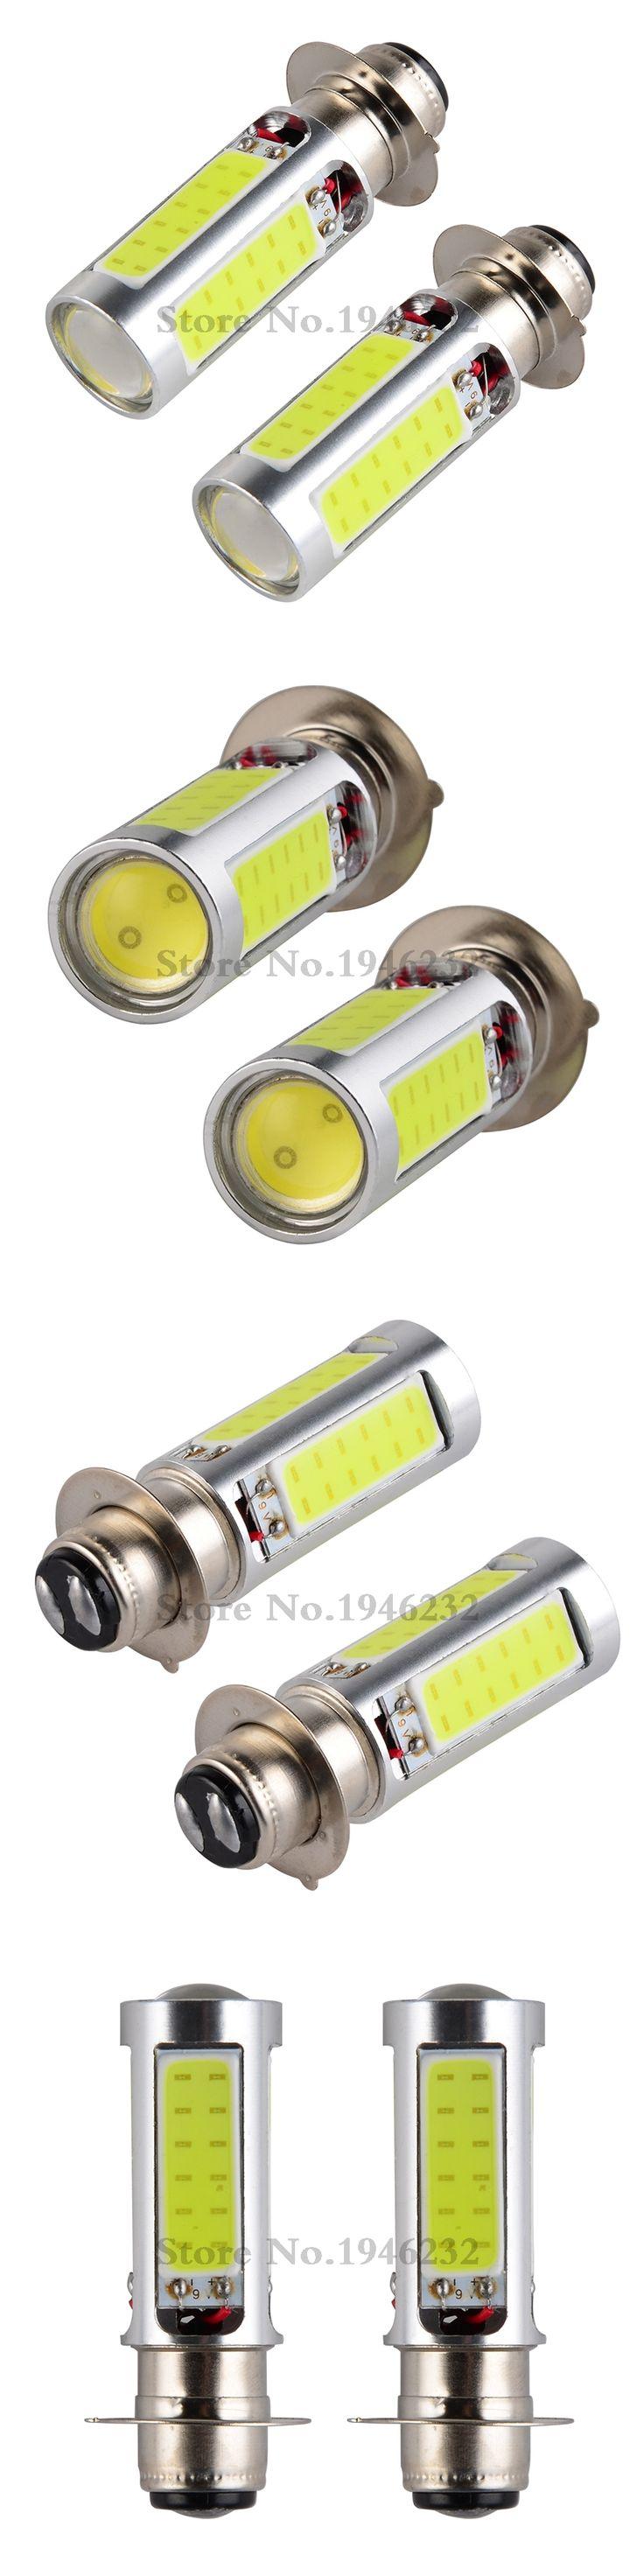 2PCS 80W H6M H6 LED Headlights Bulbs Lamps For ATVS Honda Rancher 350 400 TRX250 Recon TRX300X/EX TRX400EX TRX450ER/R TRX700XX